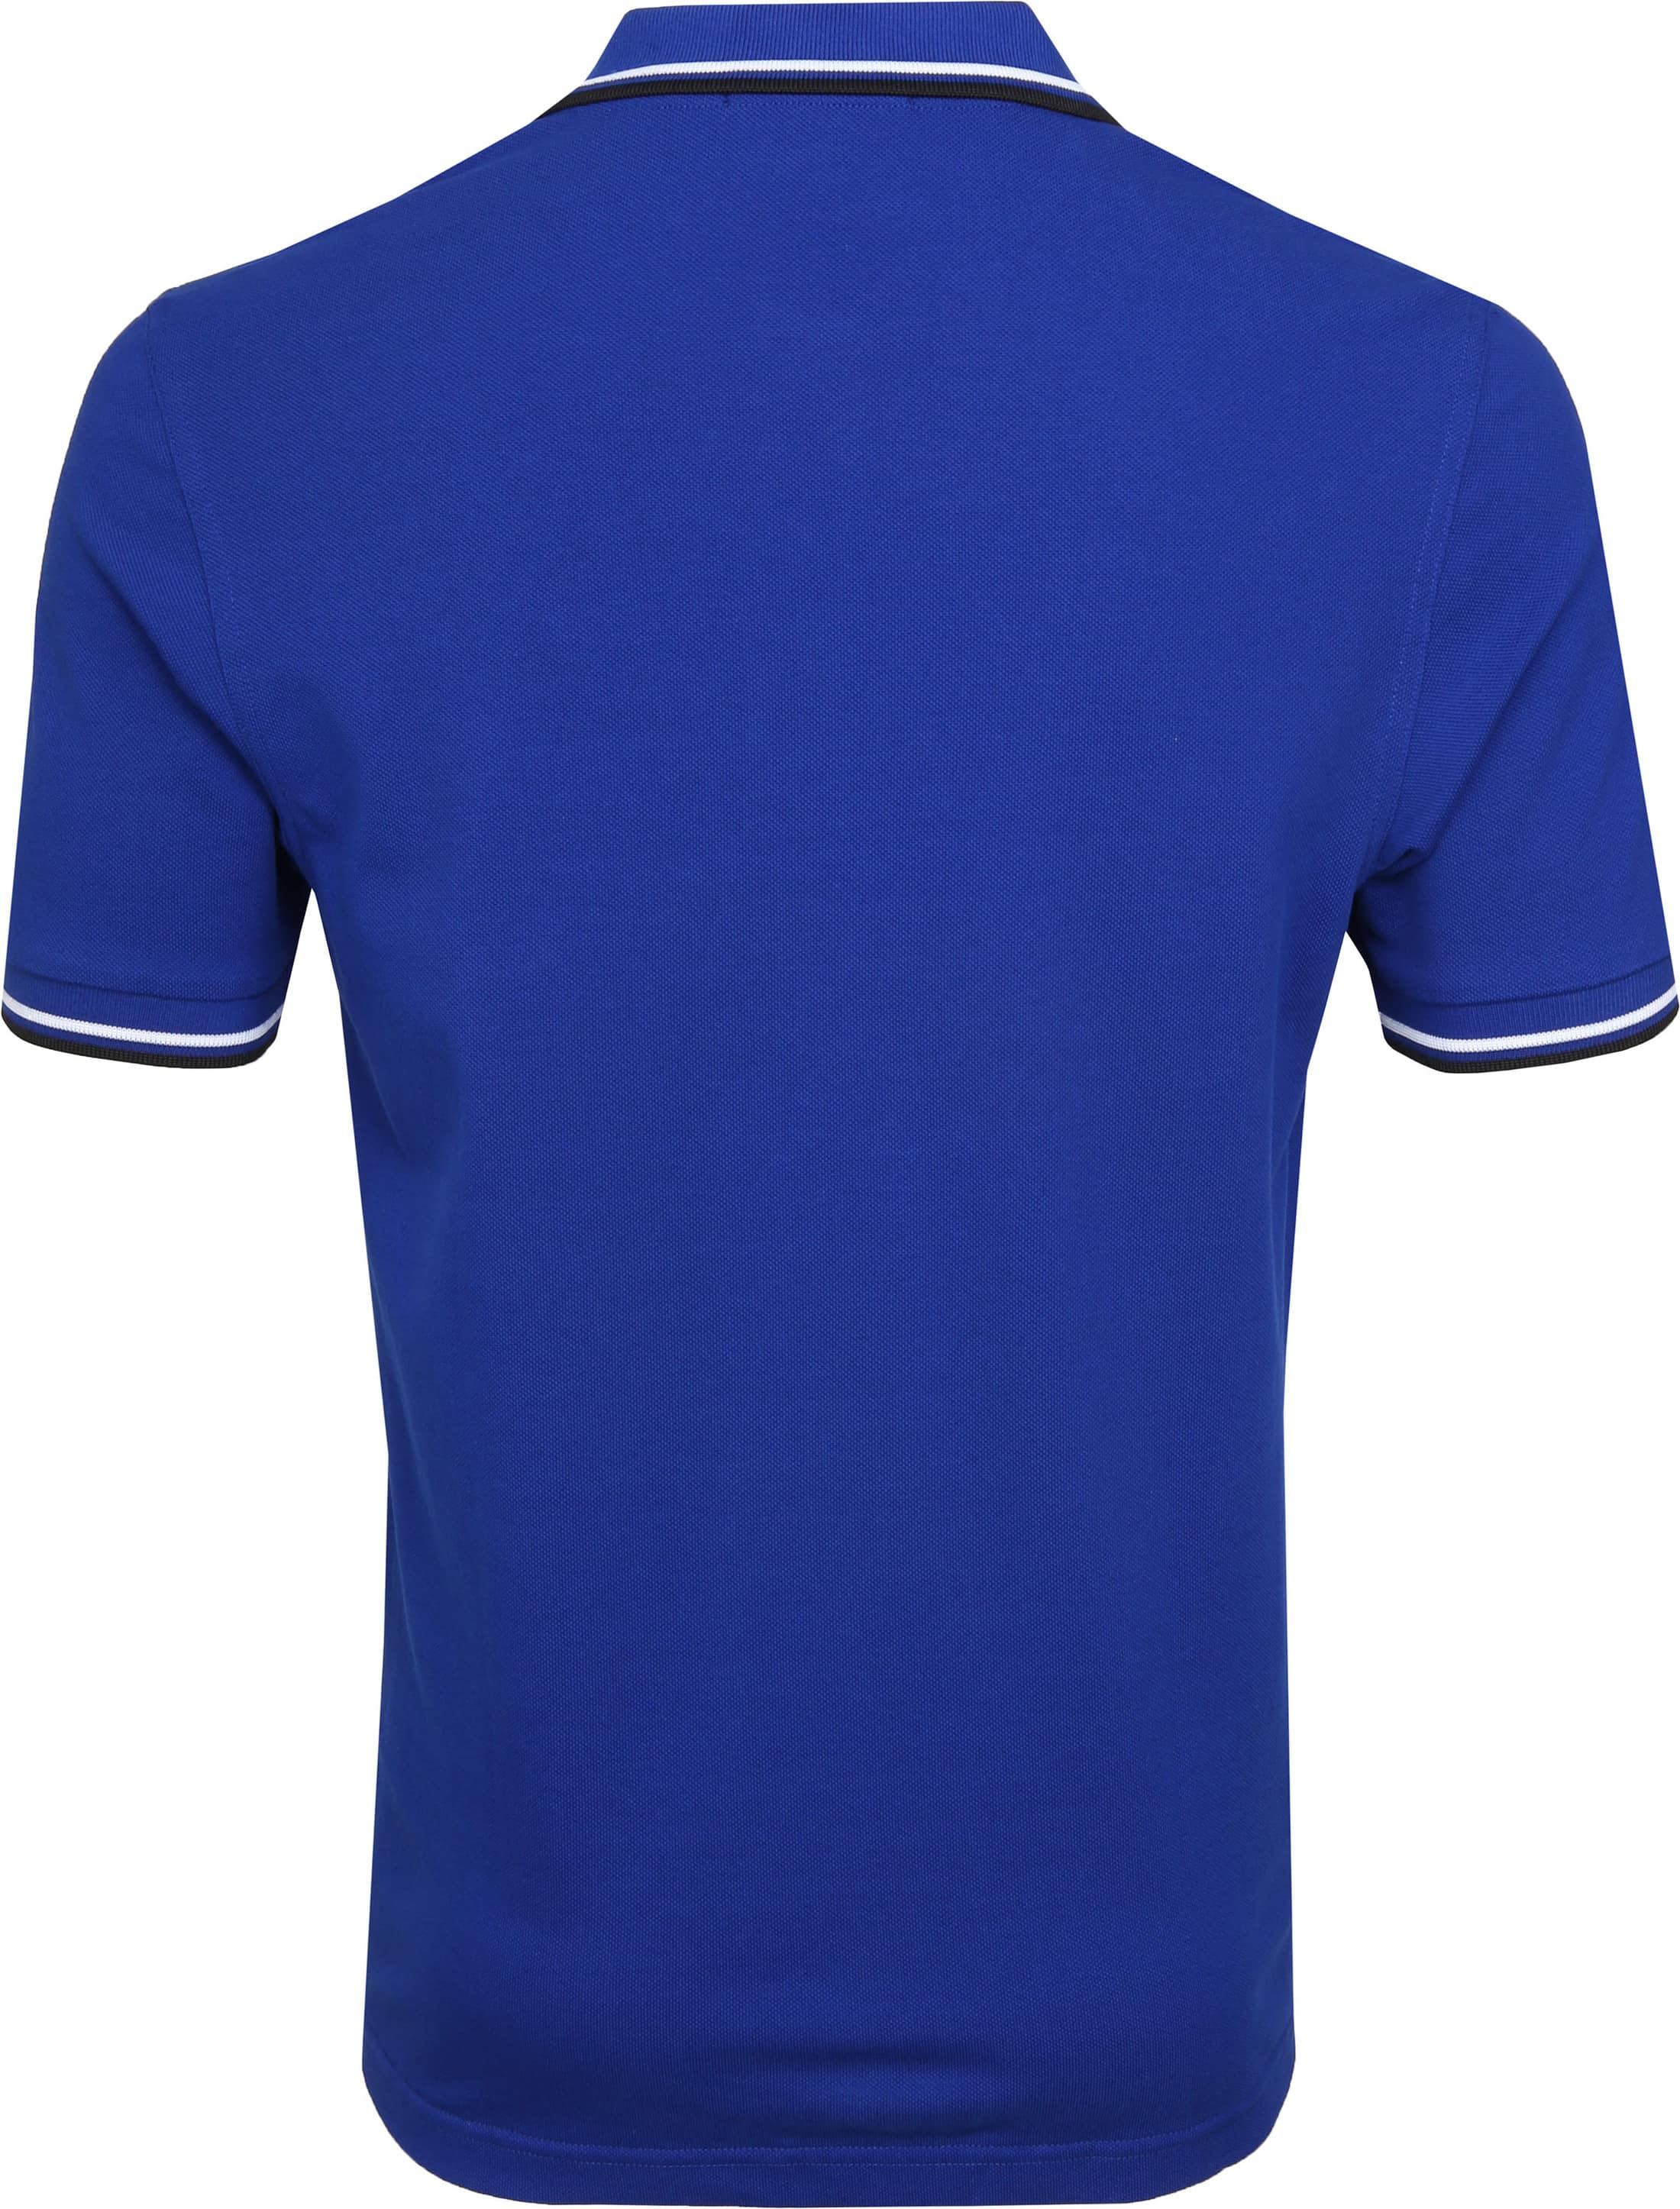 Fred Perry Poloshirt Blau I88 foto 3